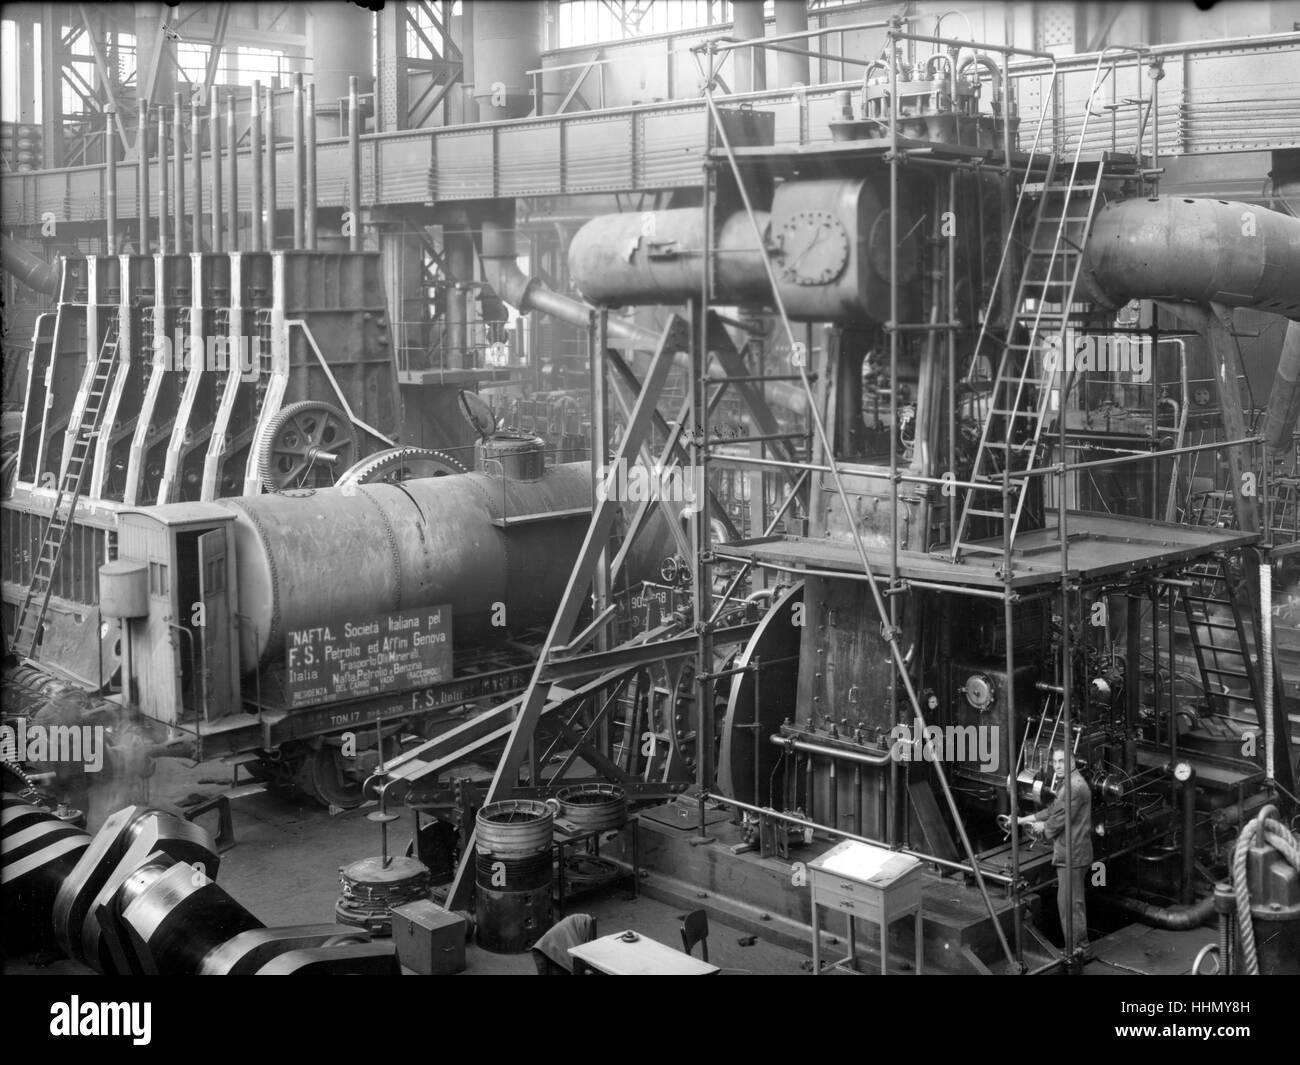 1930 - 40. Fiat - Ansaldo grandes motores en fábrica genua, San Pier d'Arena, sanpierdarena, Italia. Imagen De Stock